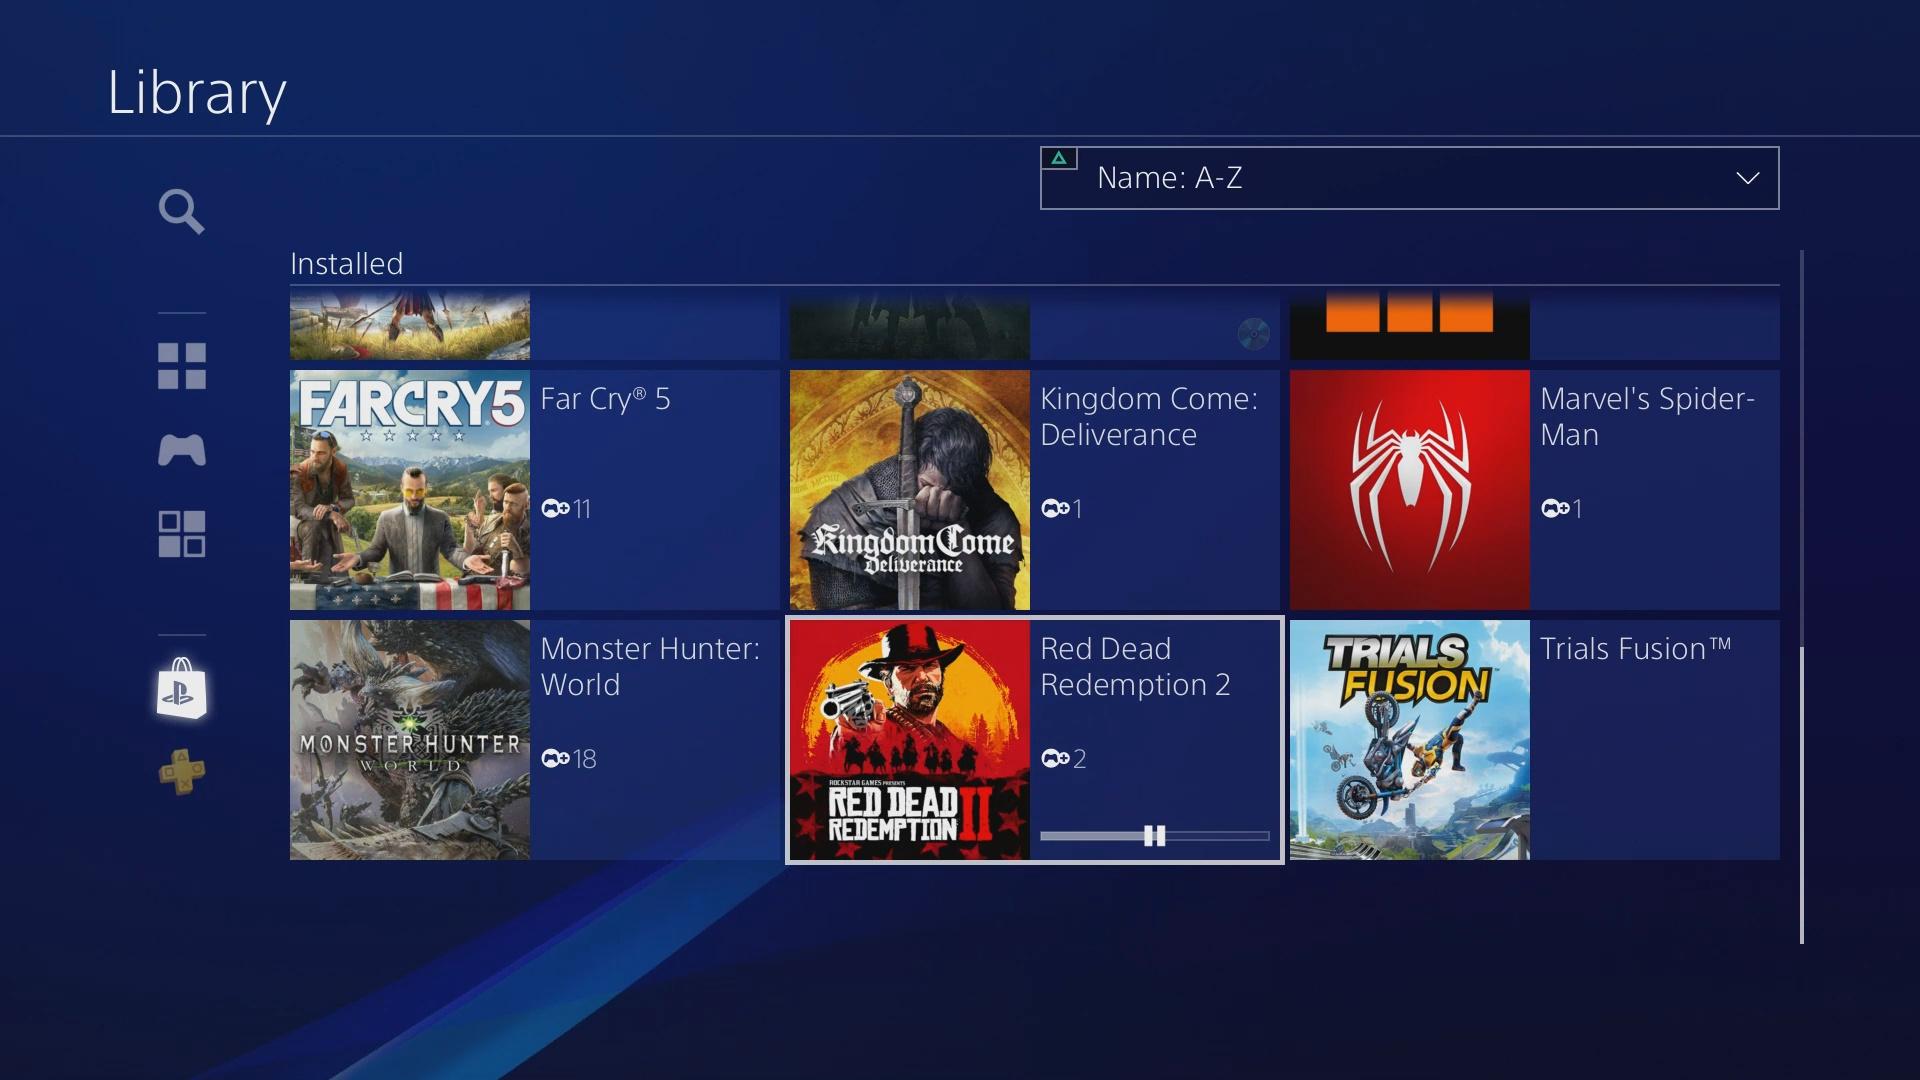 red dead redemption 2 hard copy download